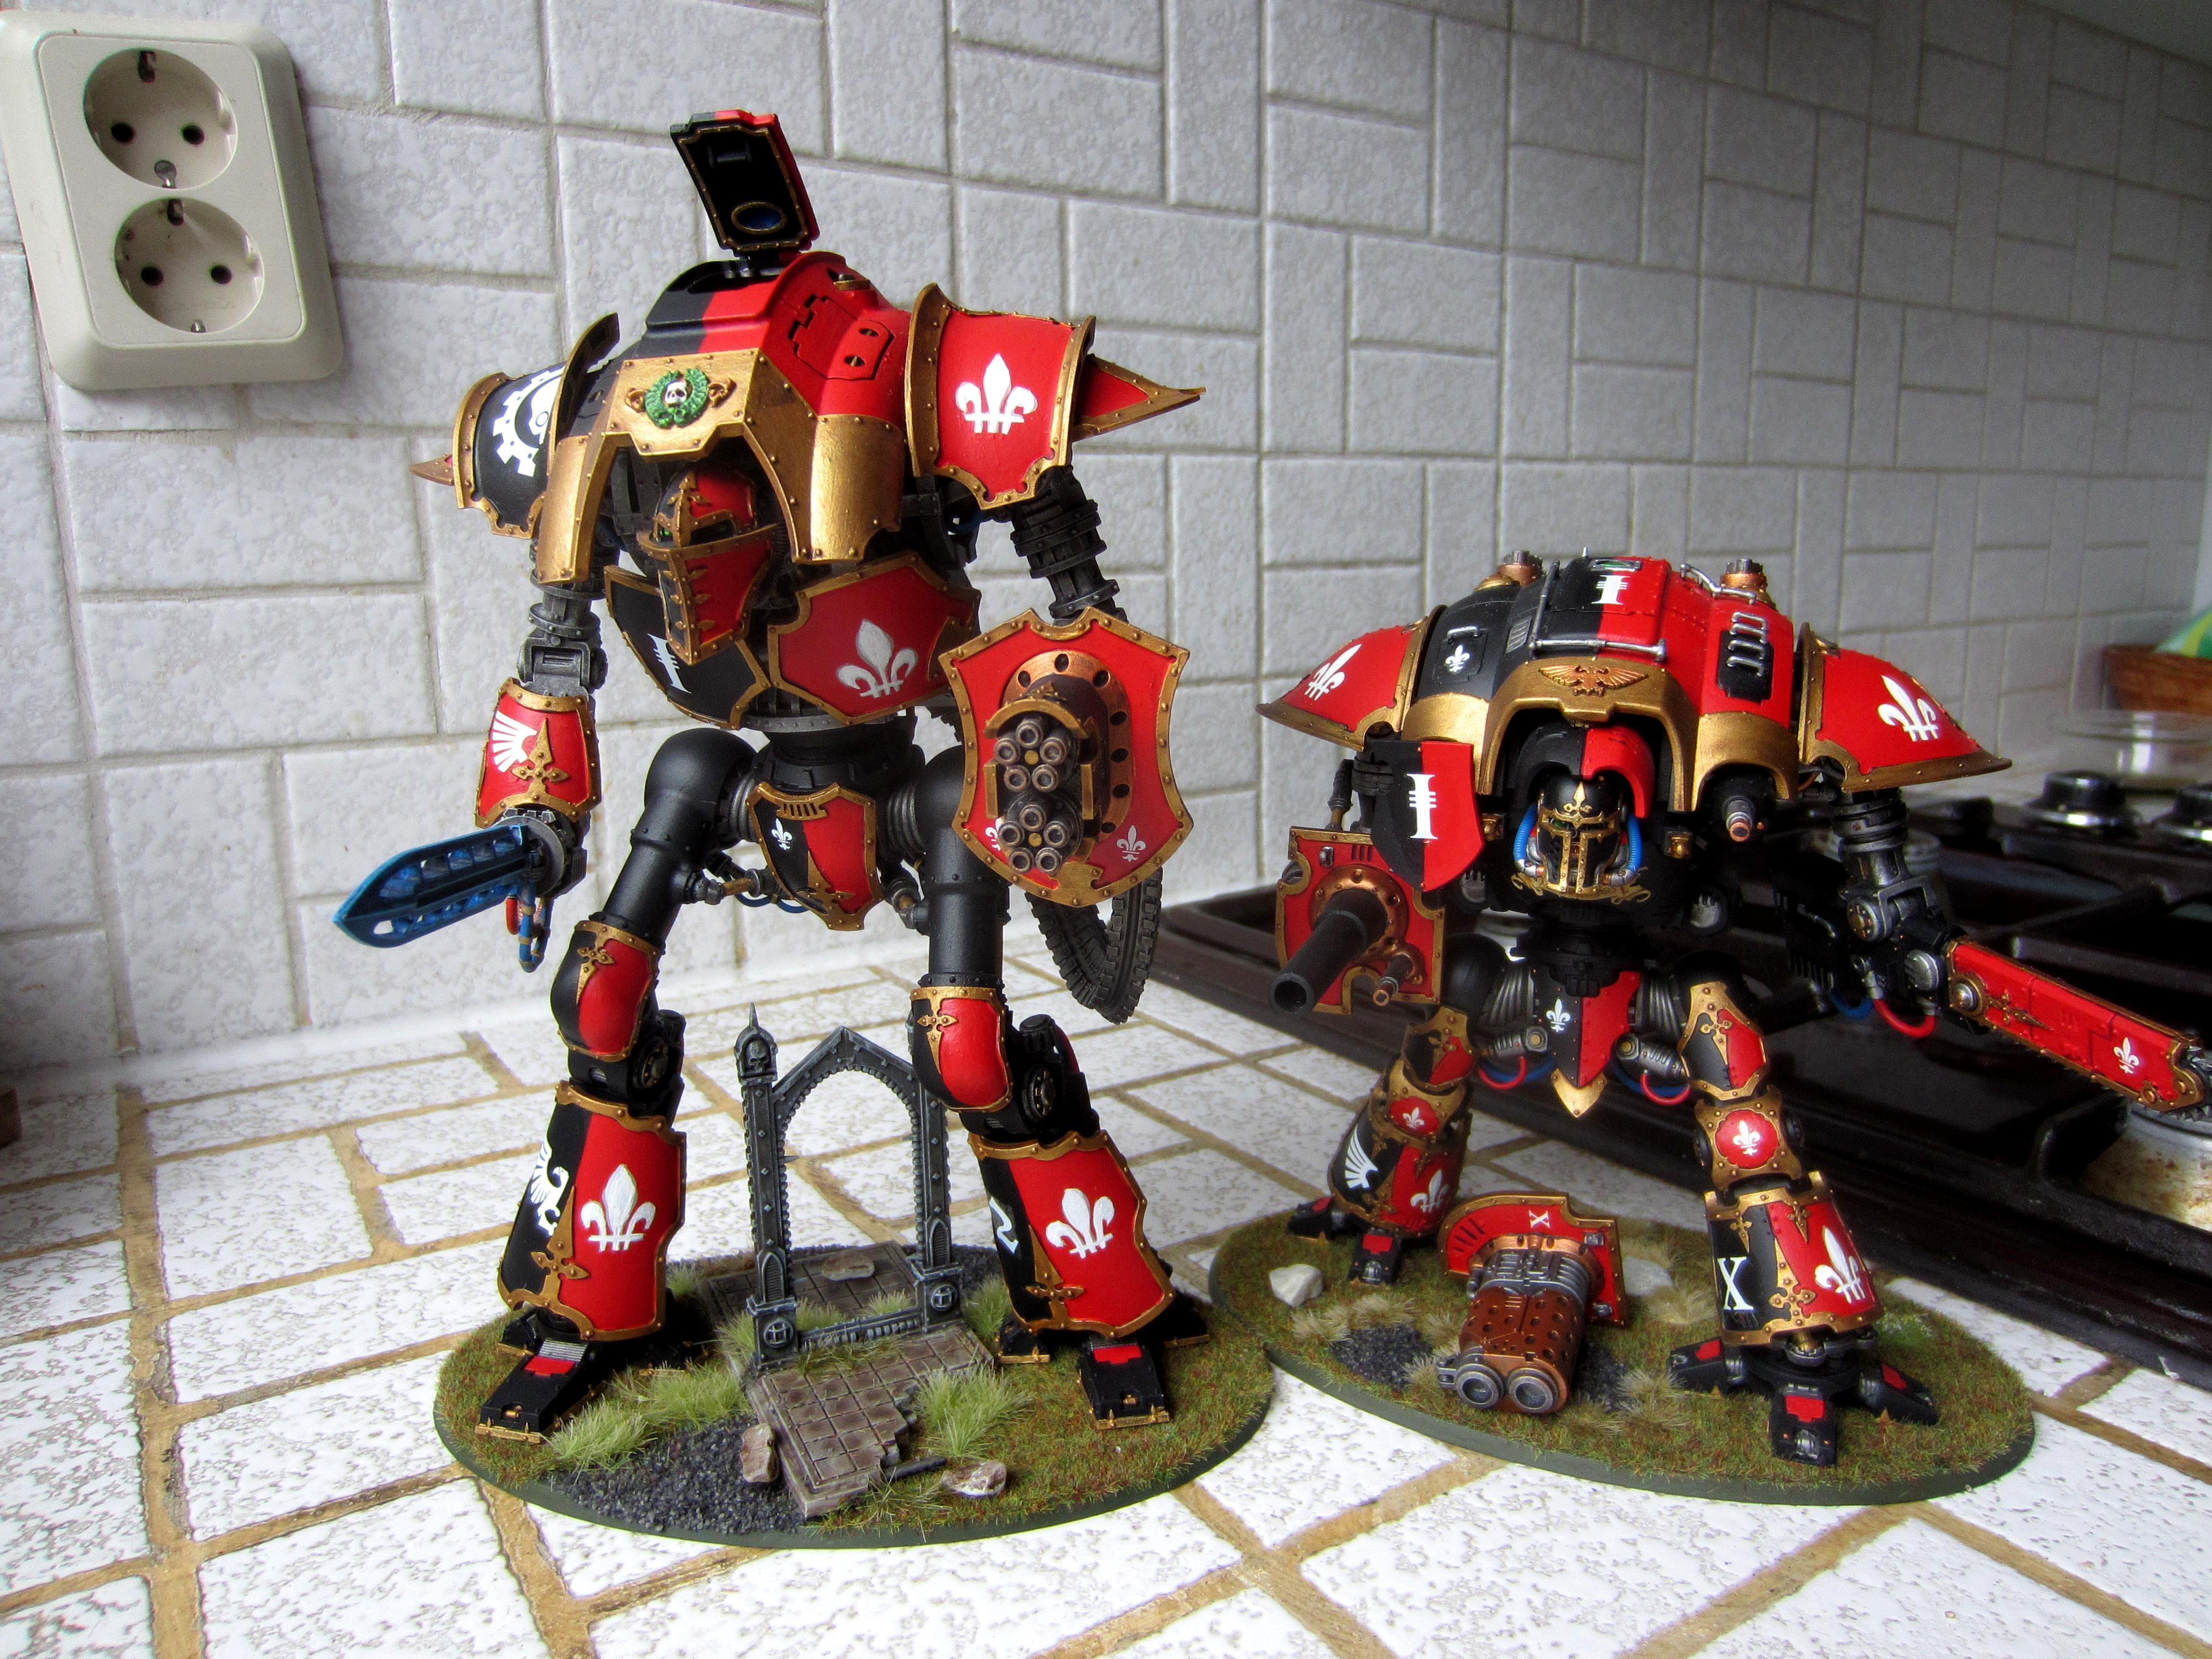 Adepta Sororitas, Castigator, Cerastus, Forge World, Knights, Sisters Of Battle, Super-heavy